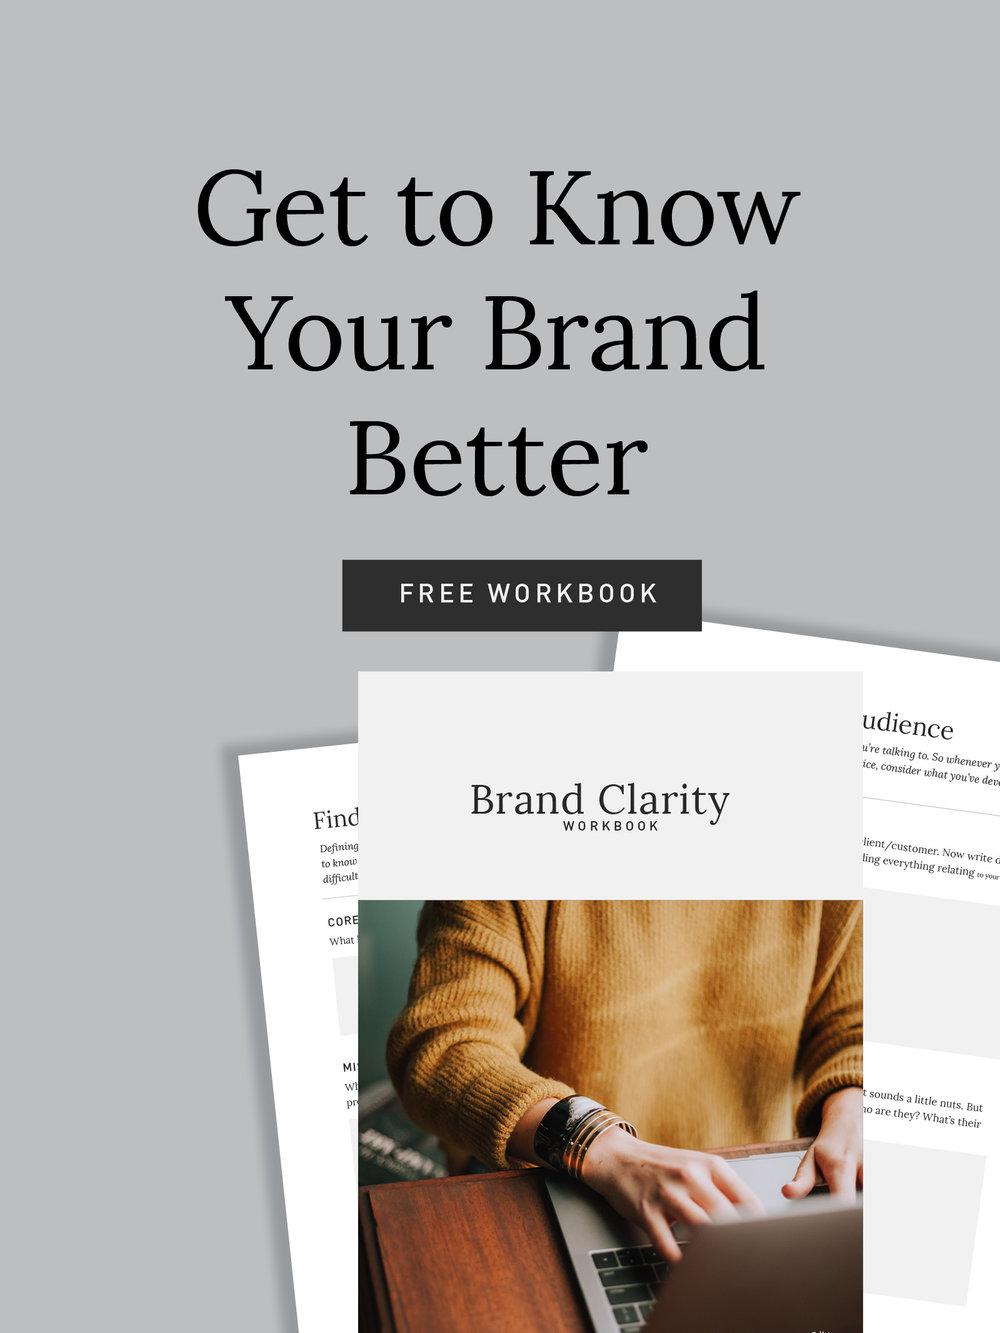 Gain brand clarity